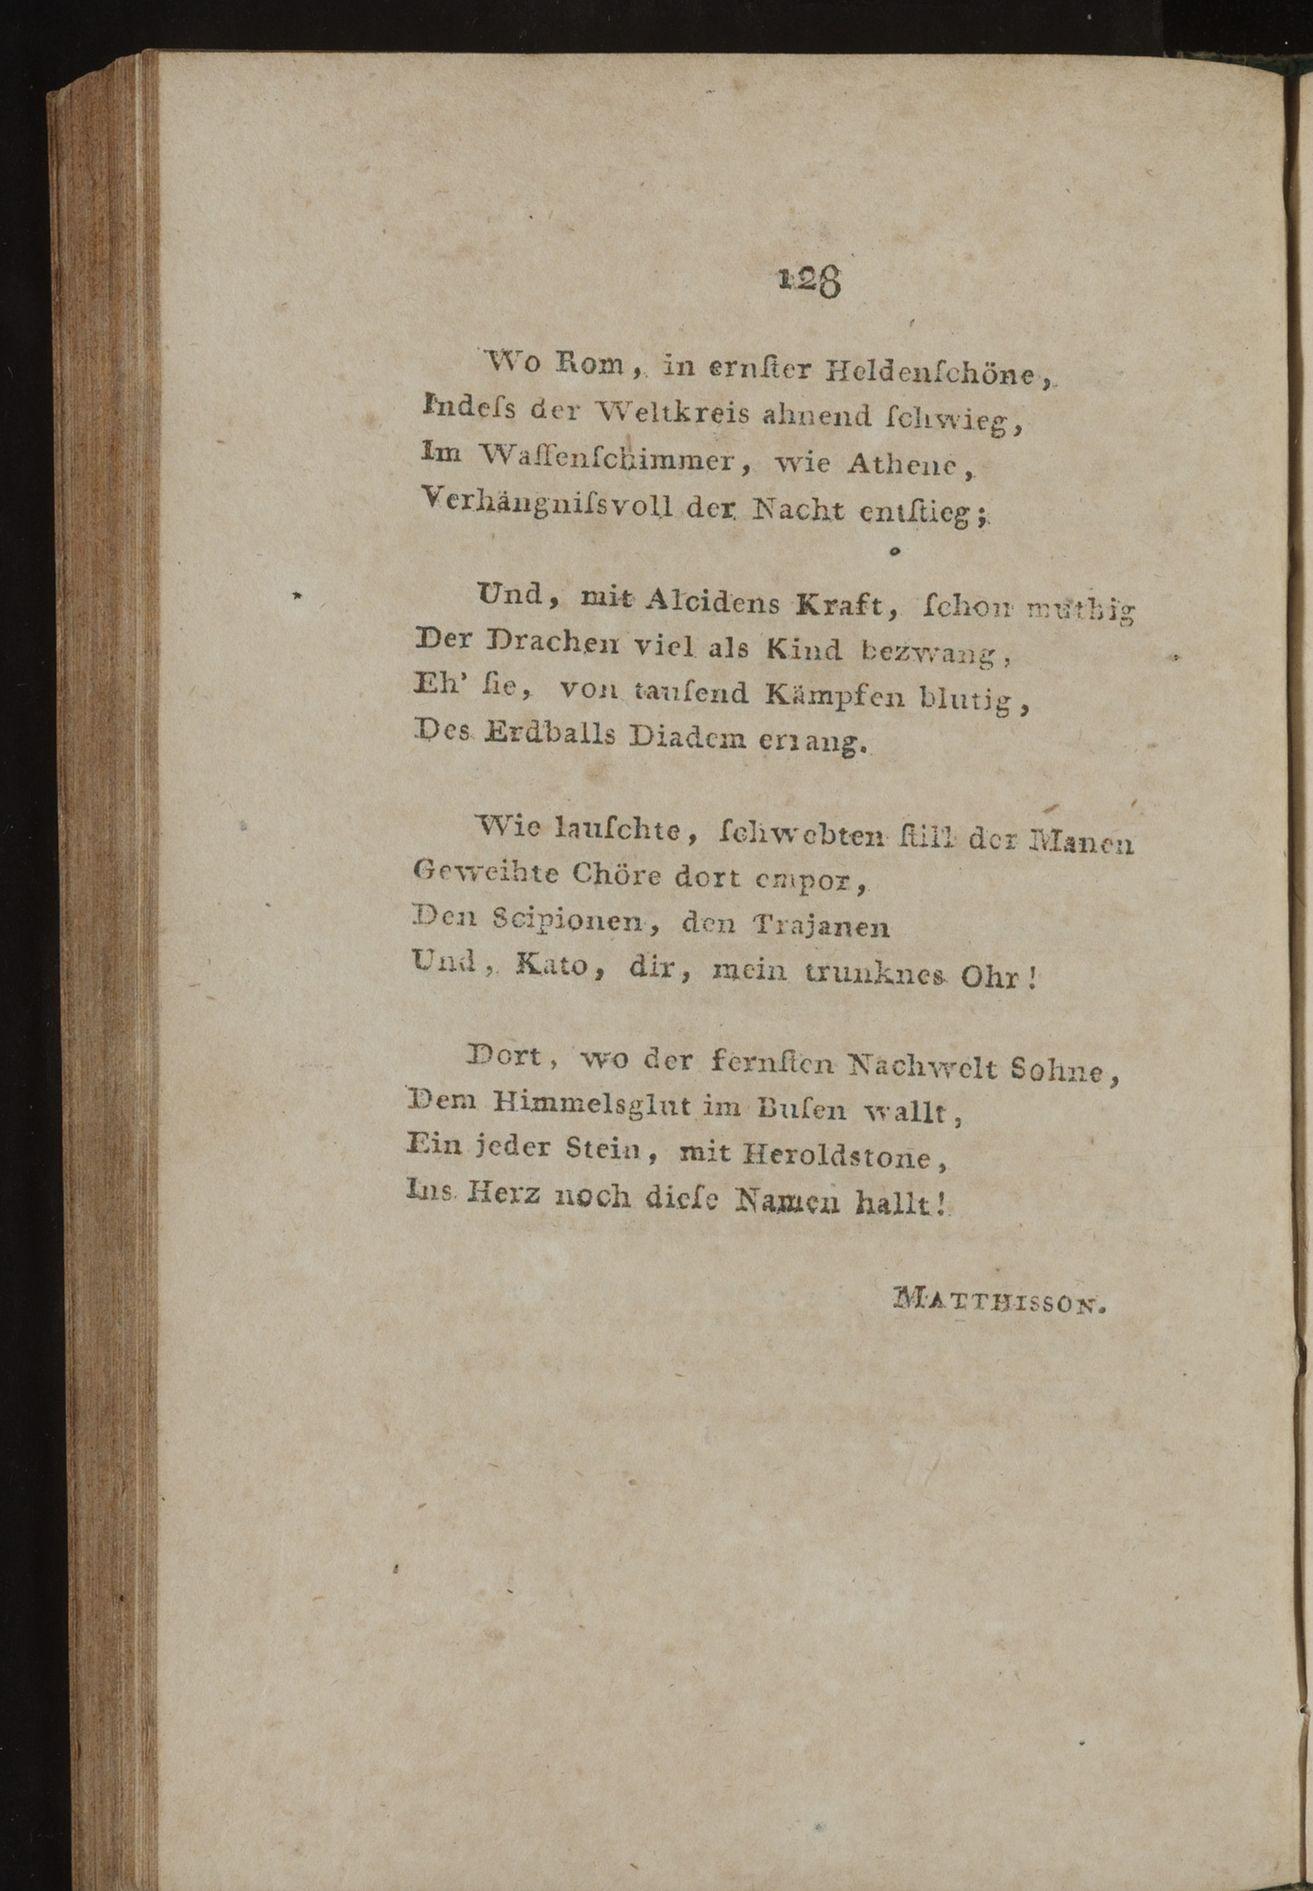 File:Schiller Musenalmanach 1799 128 jpg - Wikimedia Commons